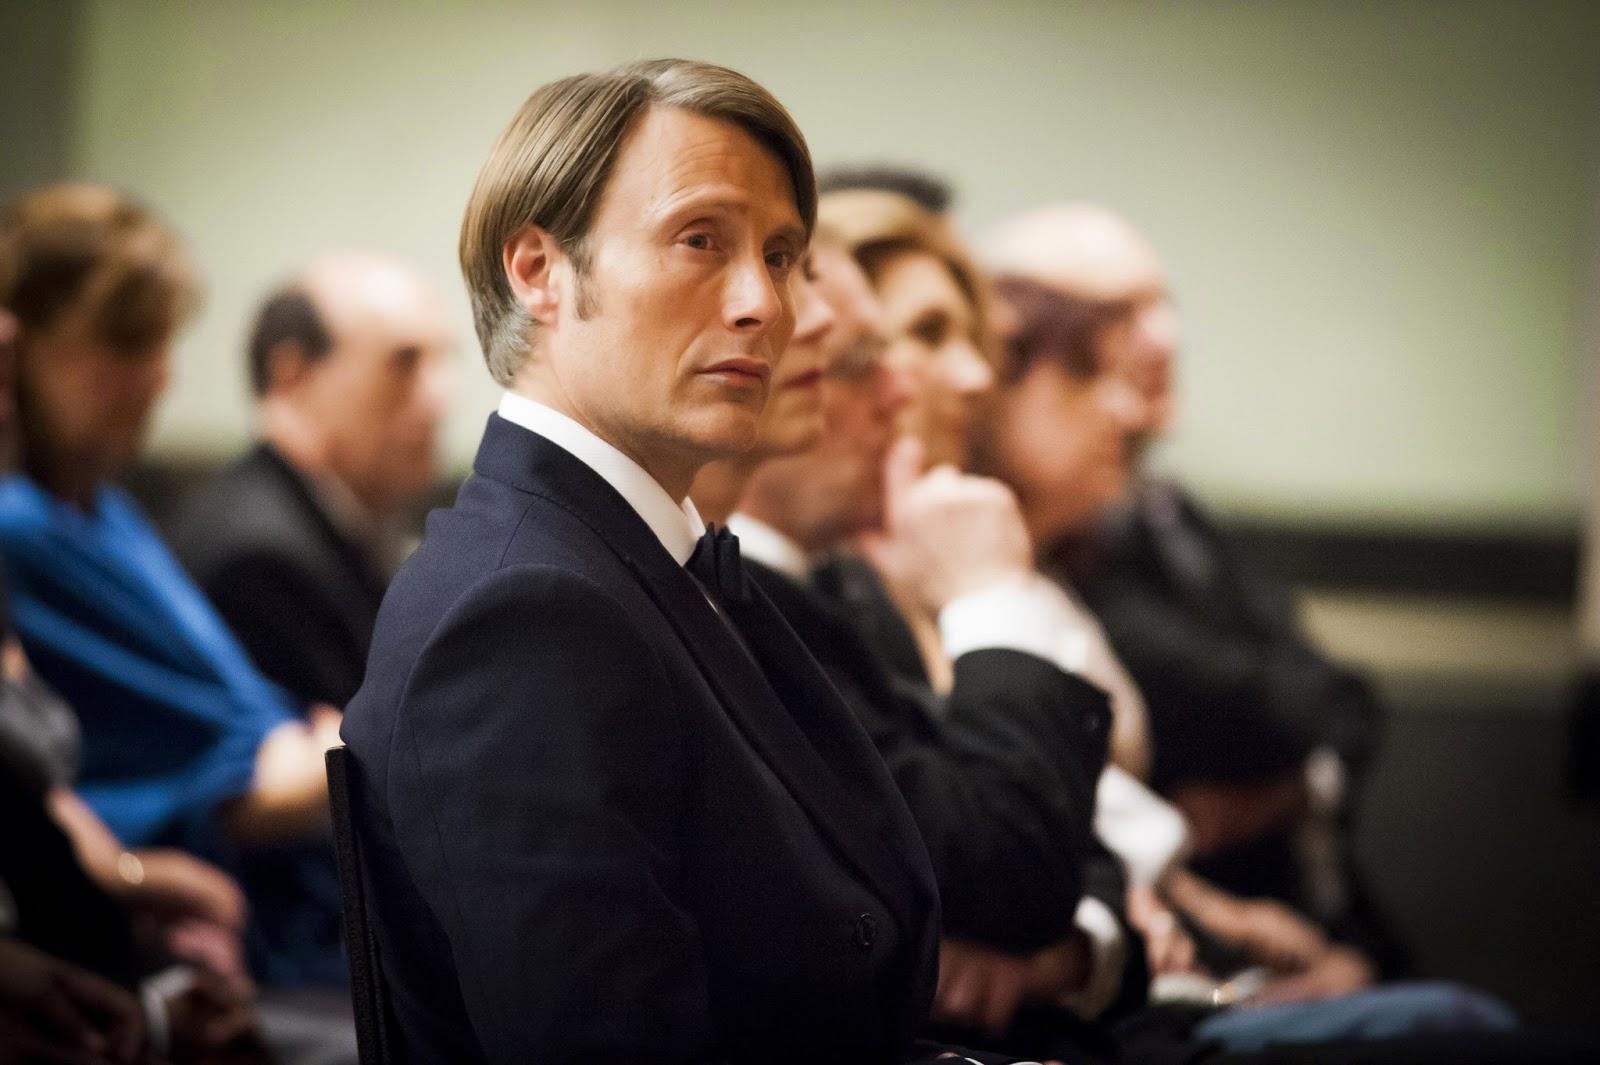 Mads Mikkelsen segunda temporada Hannibal Lecter